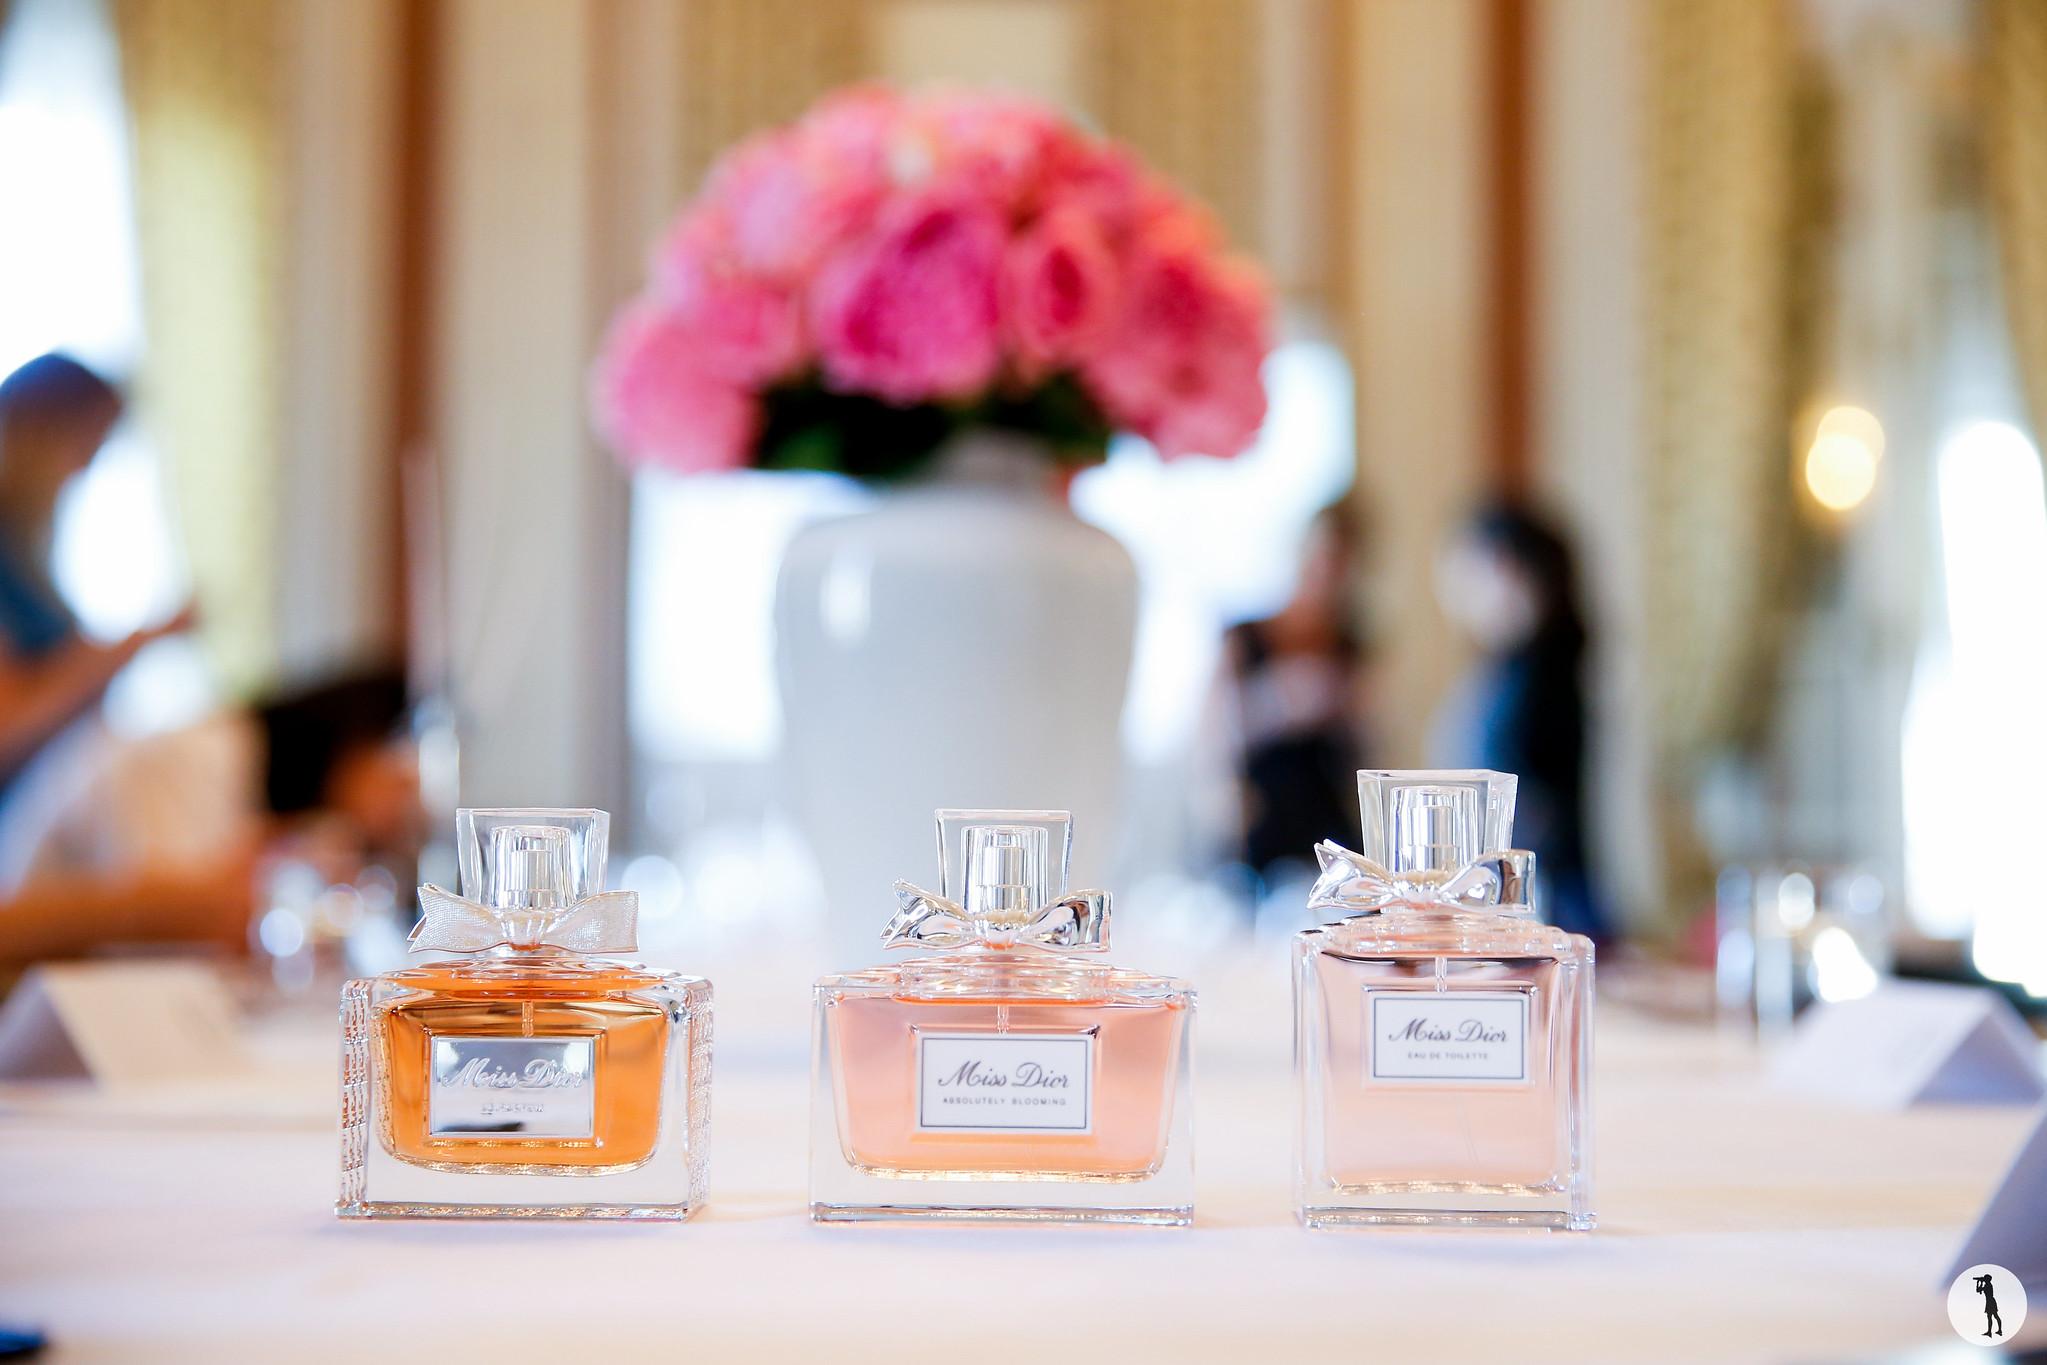 Dior California - Event for bloggers in Biarritz - June 2017